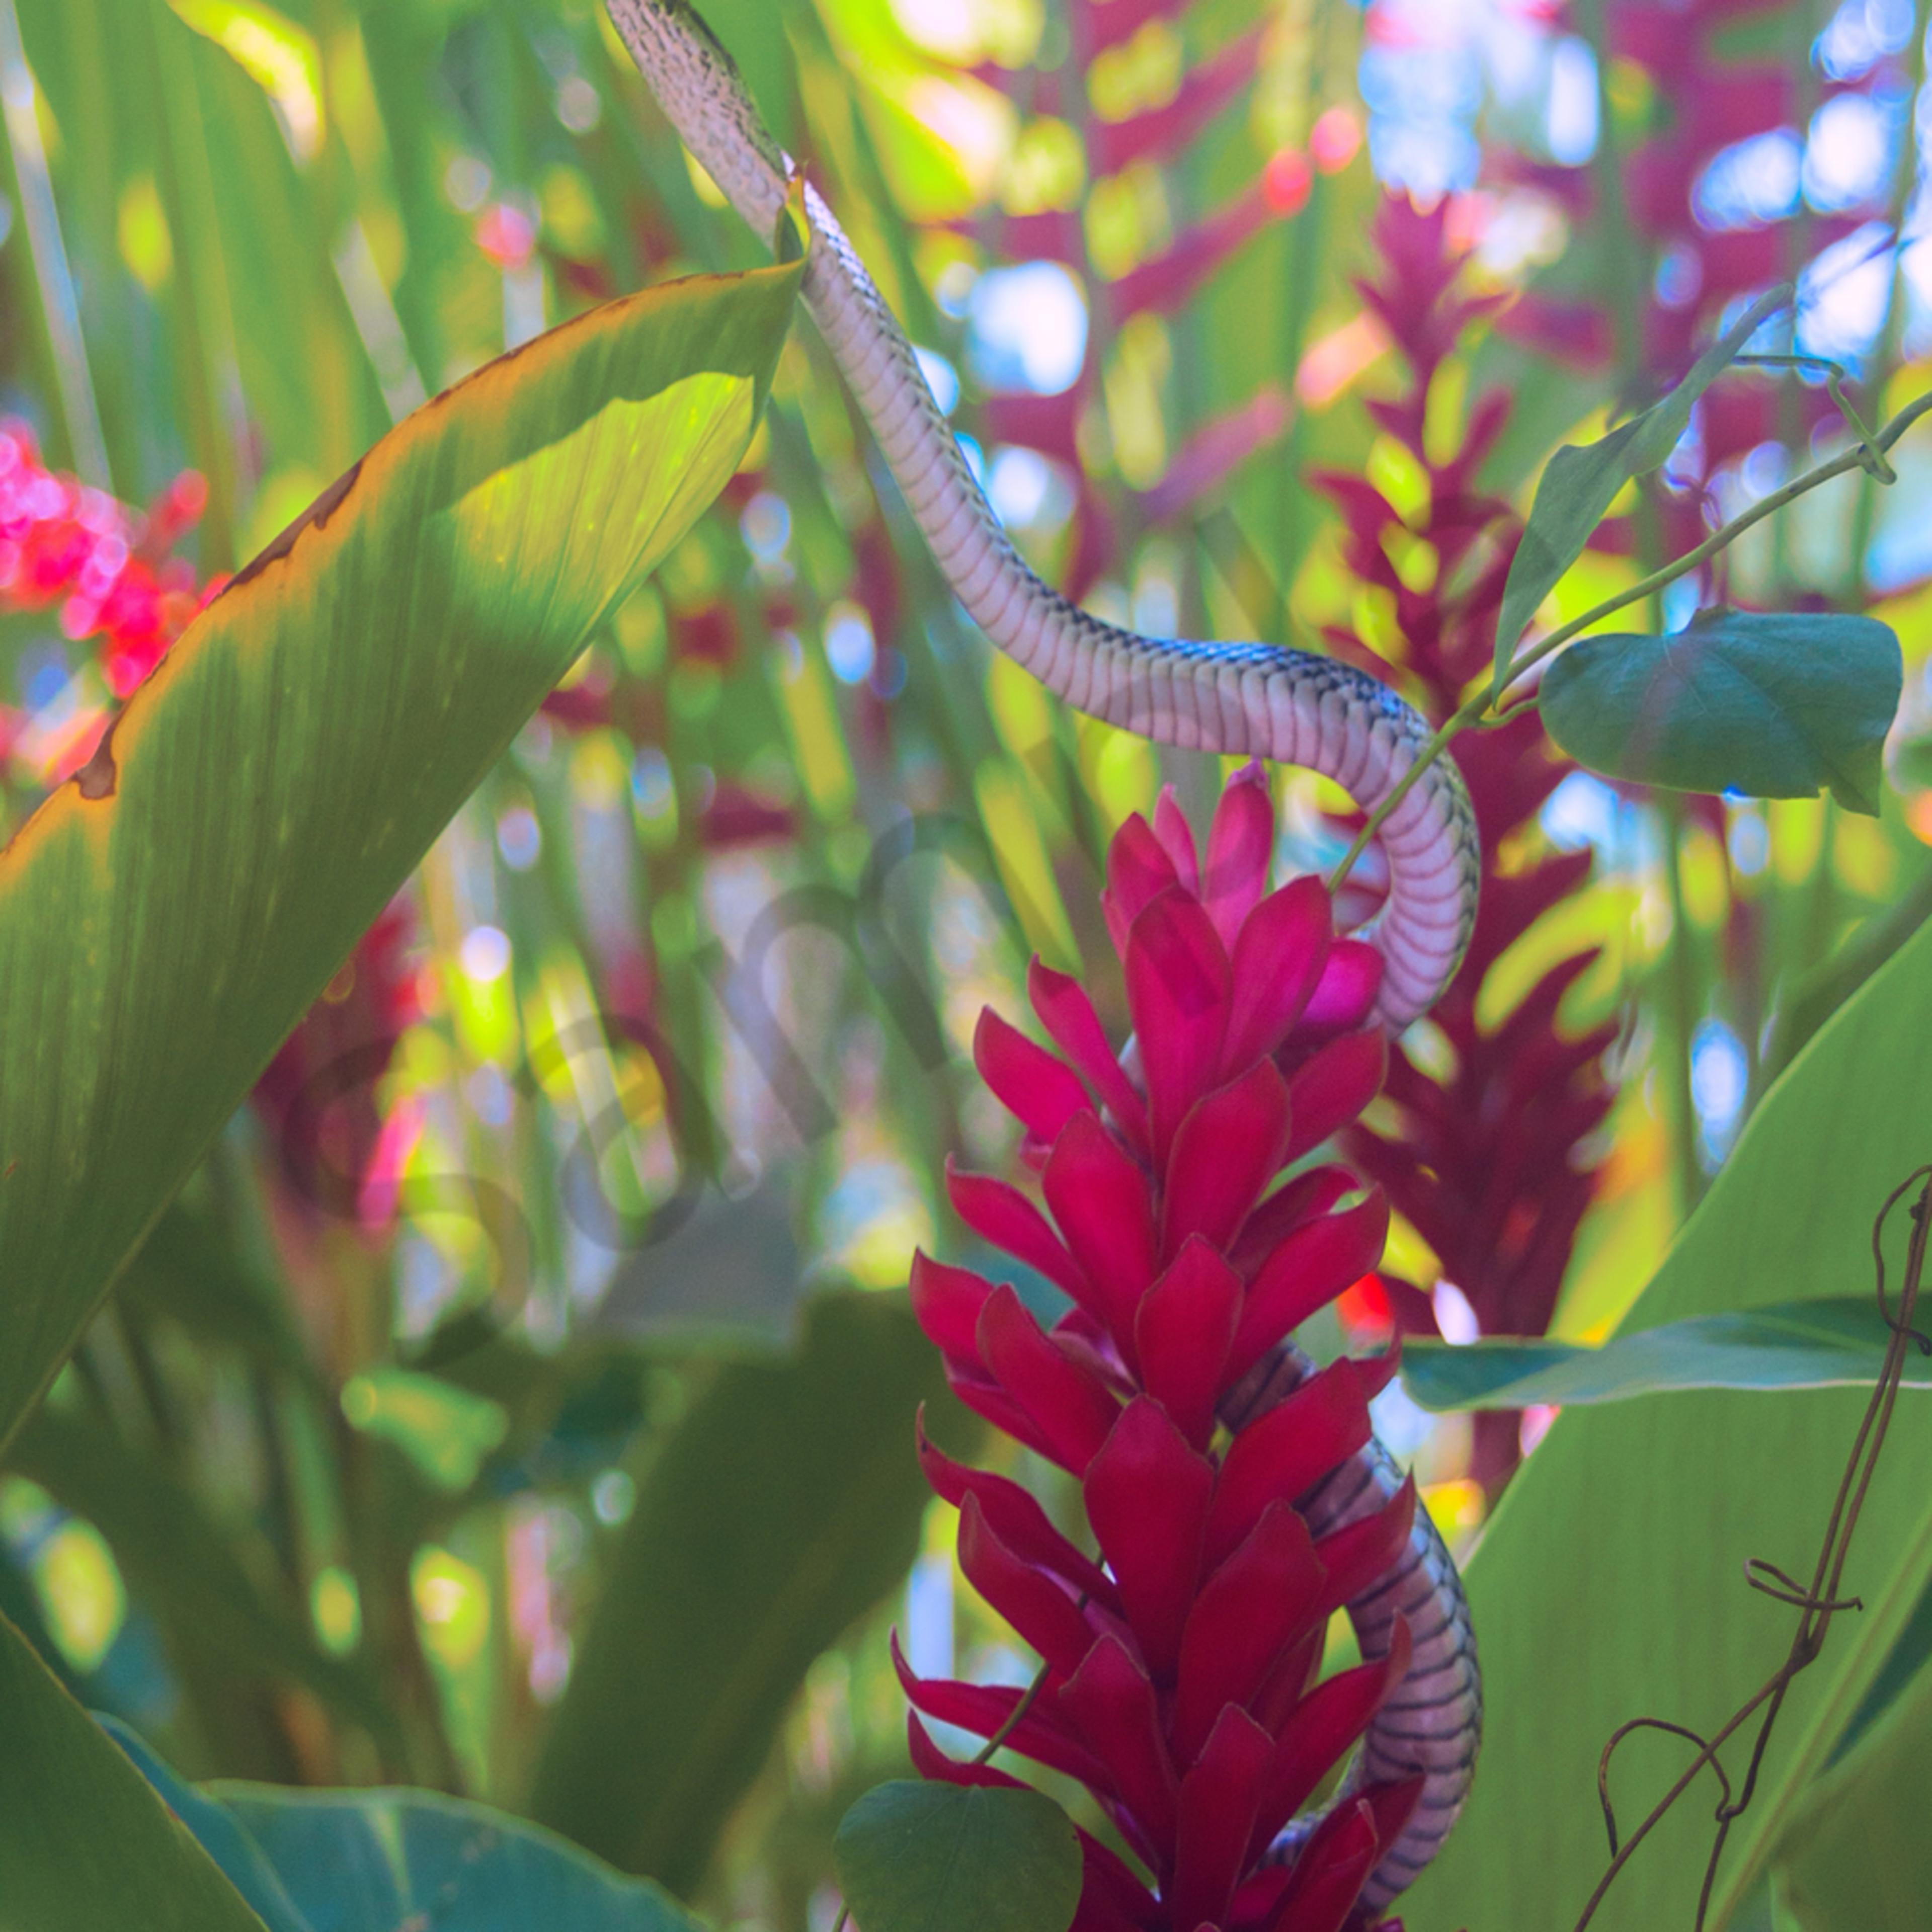 Snake in the flowers website qfsmrx